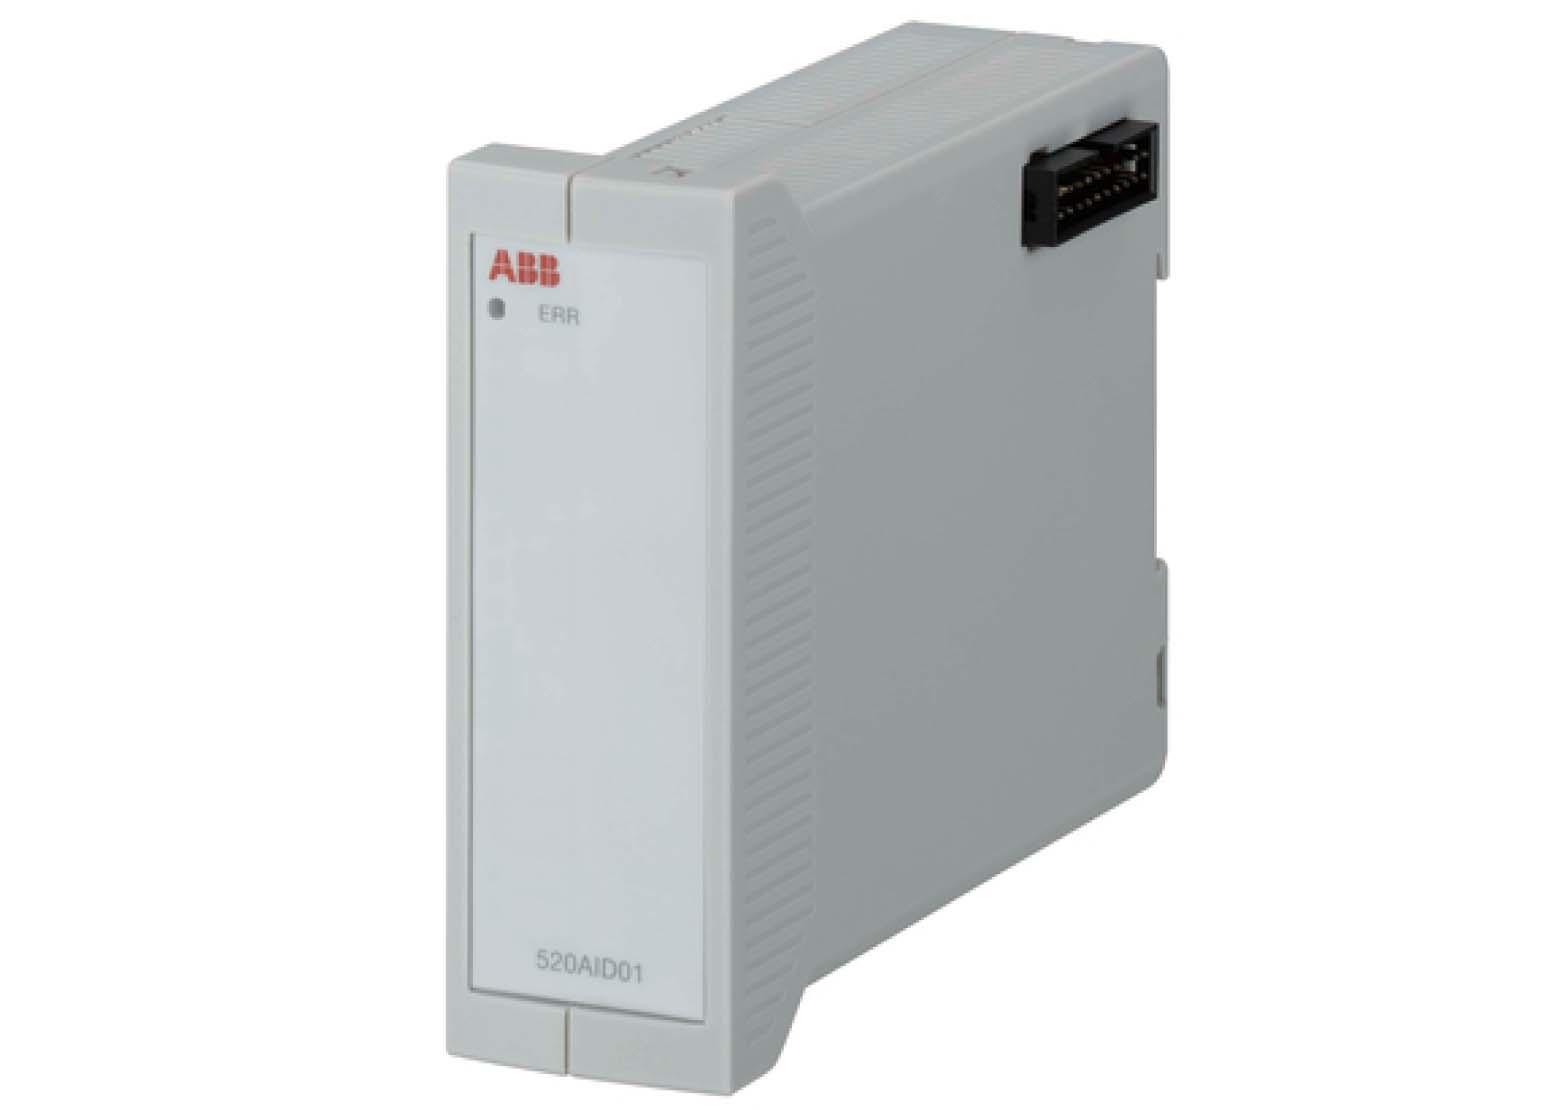 520AID01